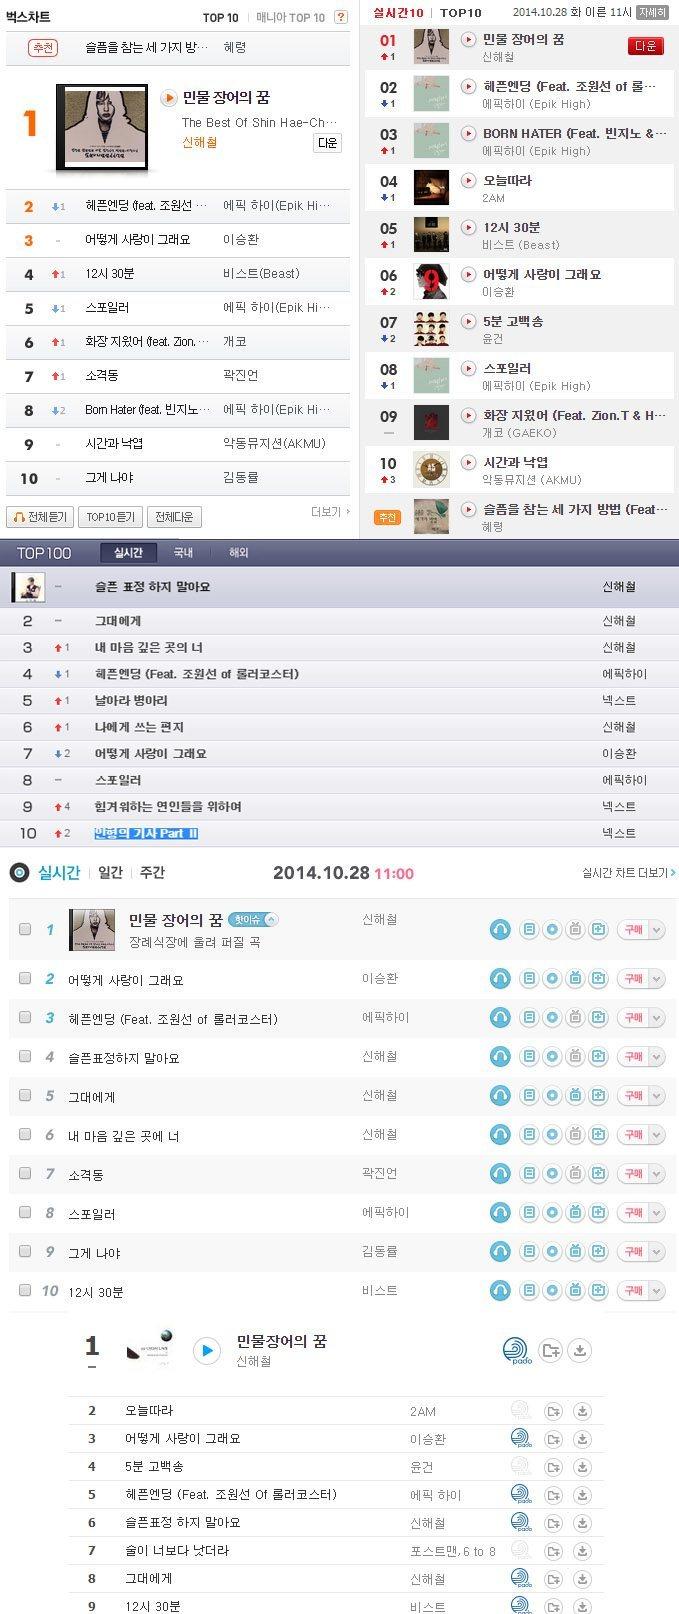 Shin Hae Chul charting